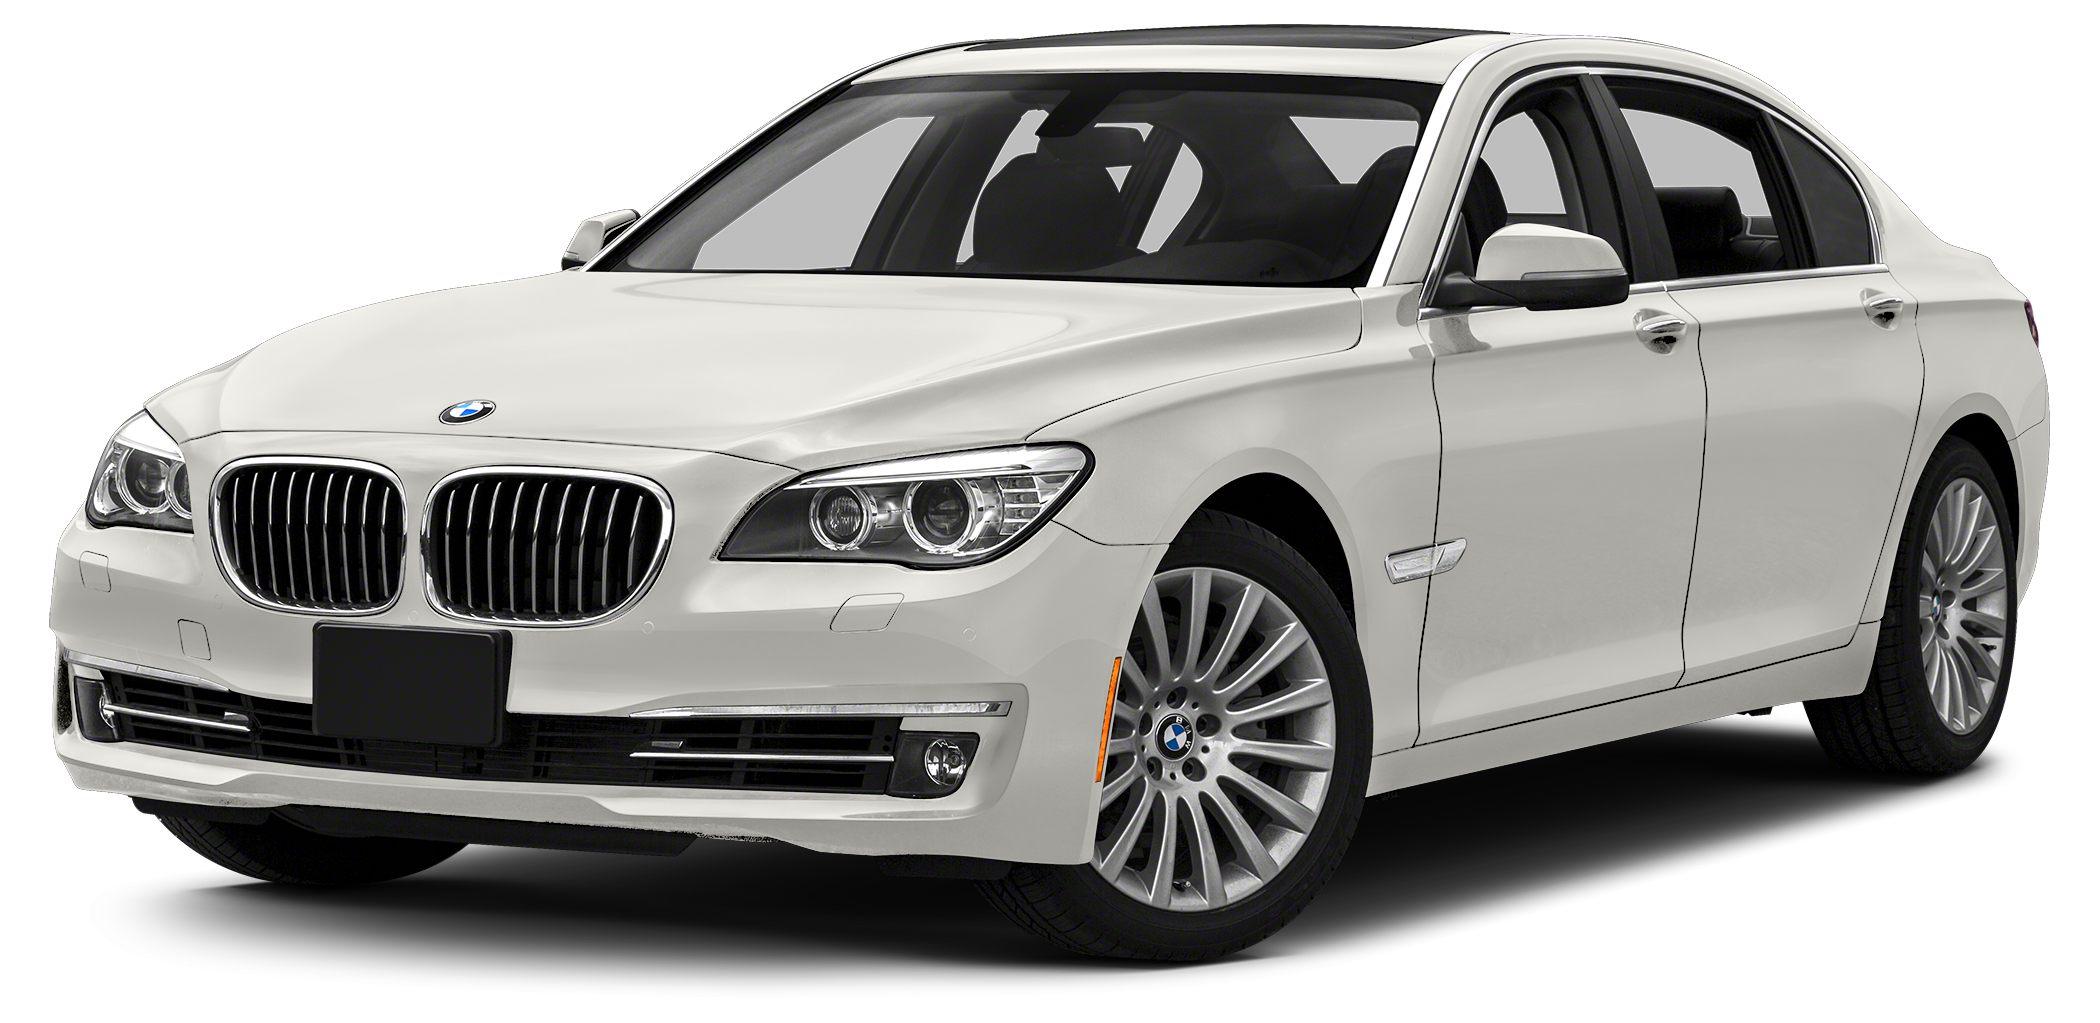 2013 BMW 7 Series 740i Miles 29545Color Alpine White Stock 143761 VIN WBAYA6C57DD143761